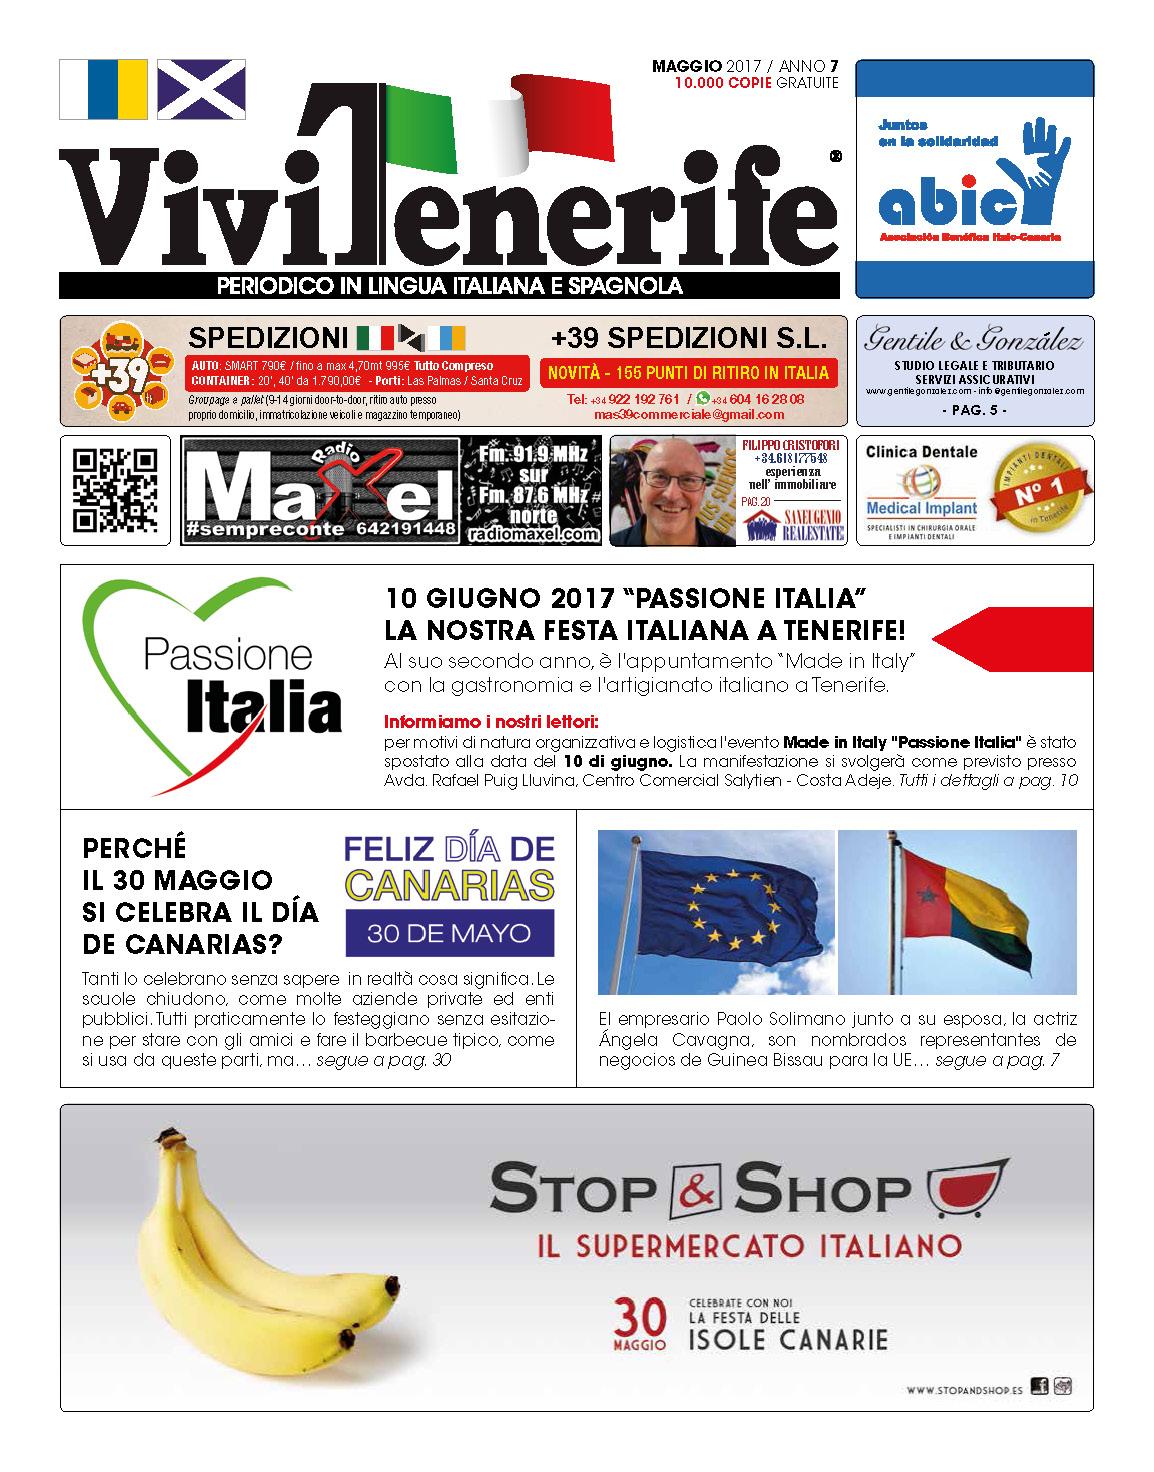 ViviTenerife Maggio 2017